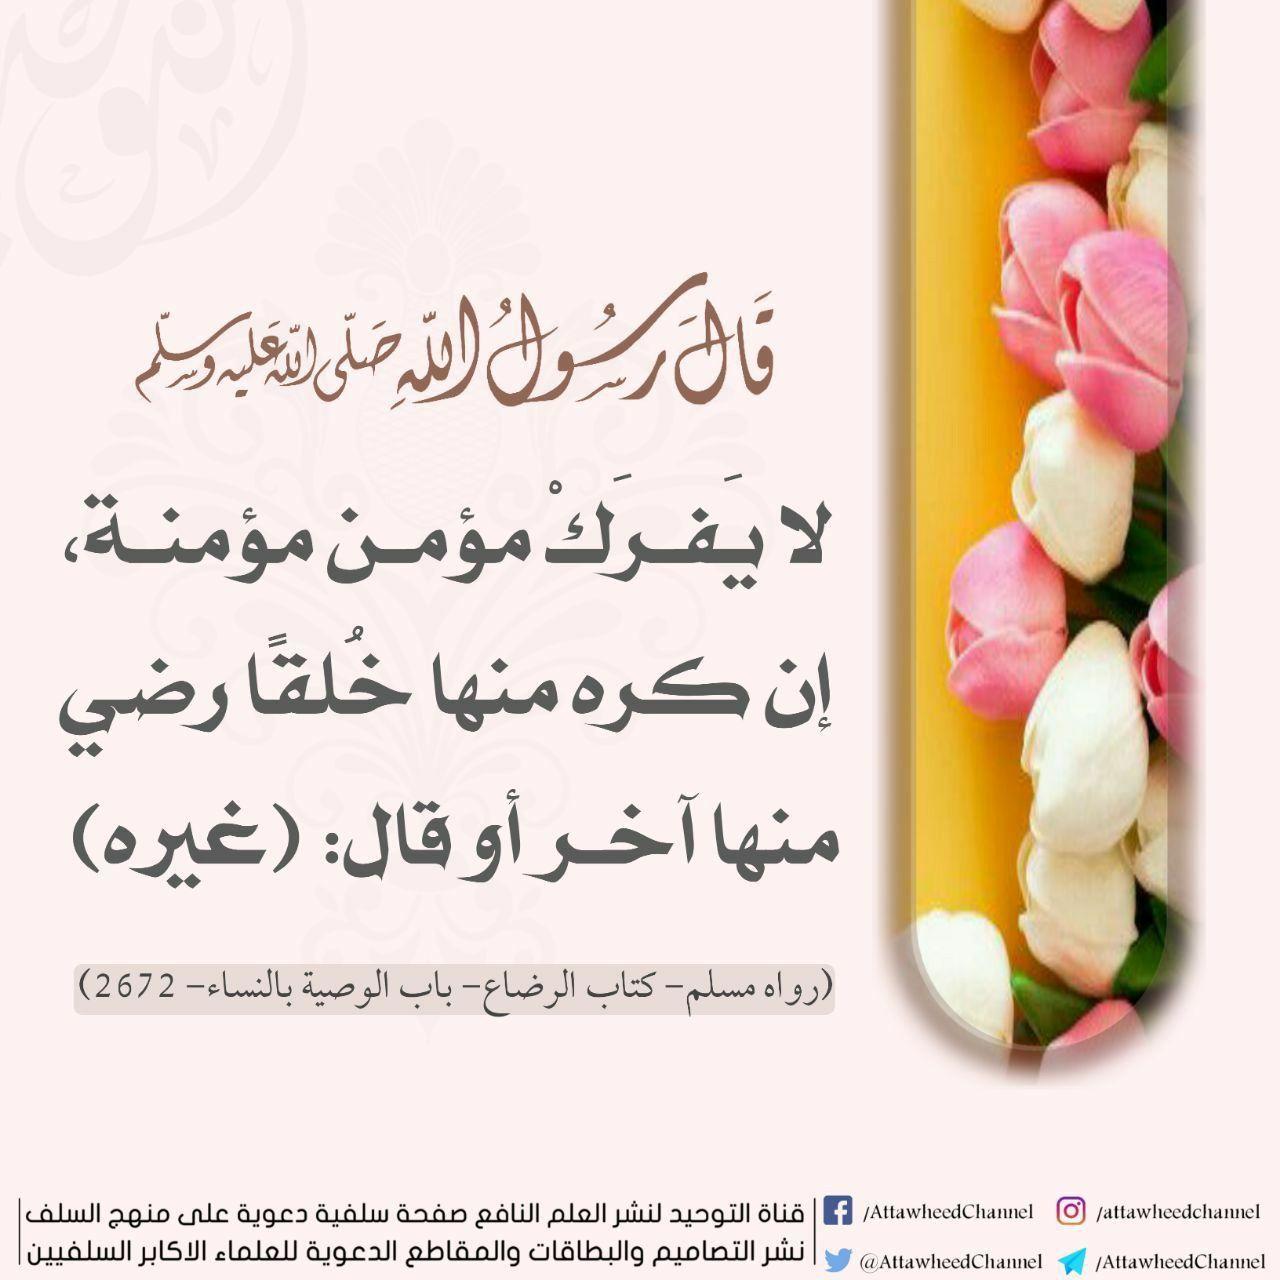 Pin By الراجية عفو ربها On أحاديث عن الرسول صلى الله عليه وسلم Place Card Holders Islamic Pictures Place Cards